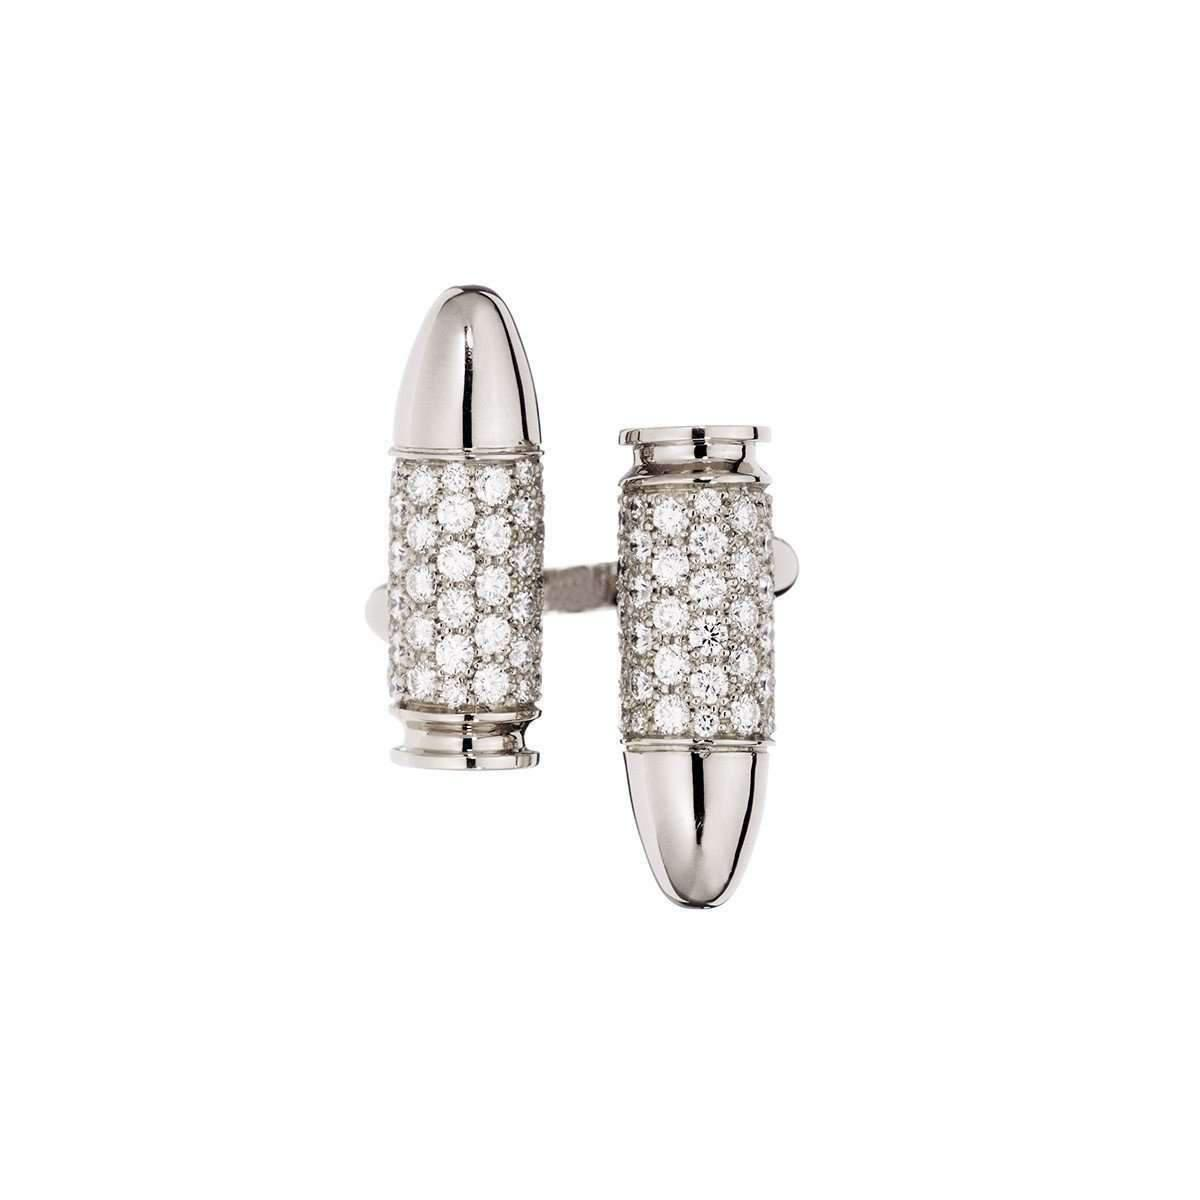 Akillis Bang Bang Toi and Moi White Gold Black Diamond Set Ring - UK L 1/4 - US 5 3/4 - EU 52 h9ecGd6Au